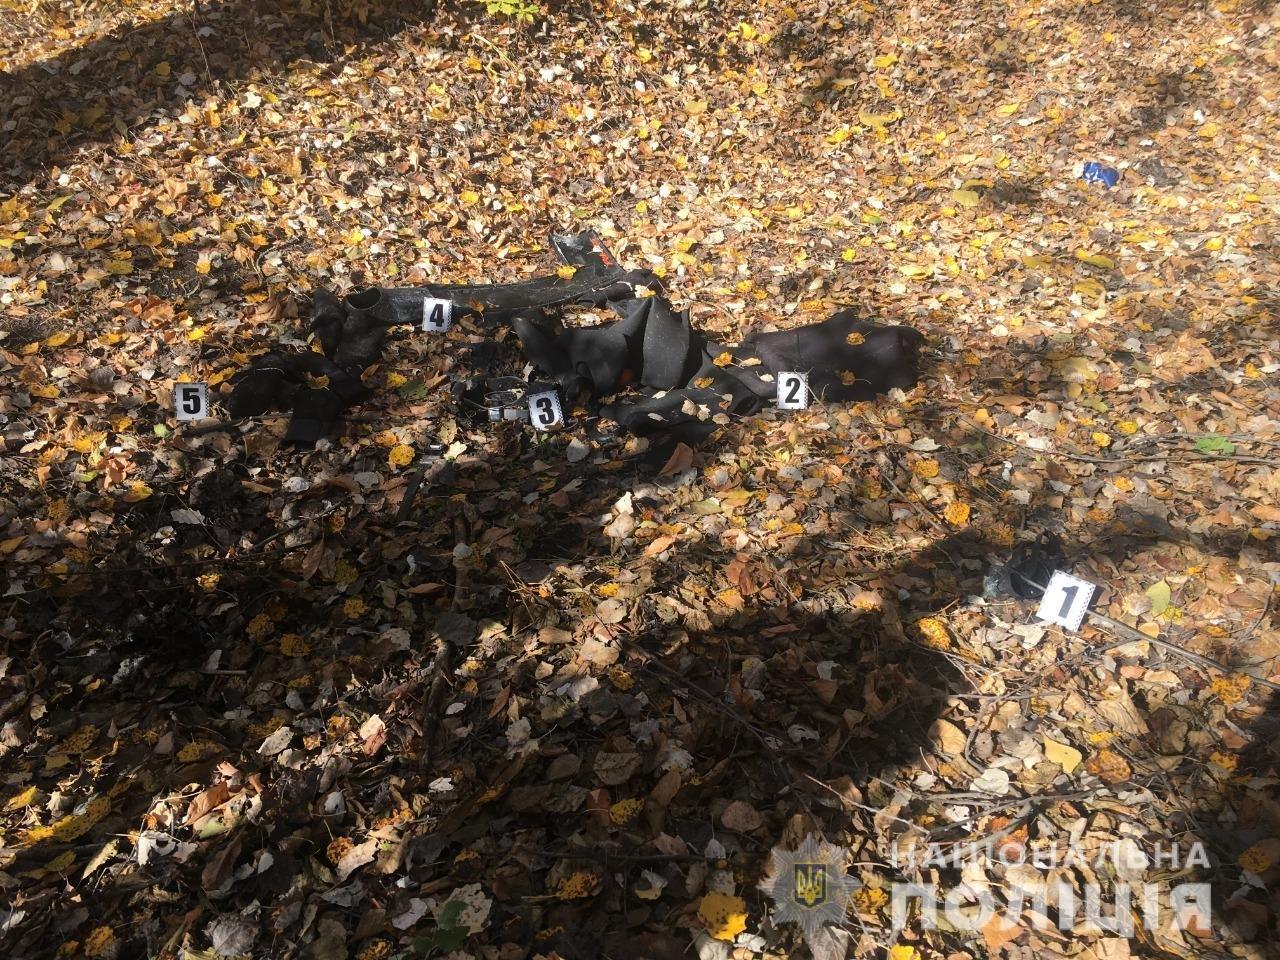 Напал и ограбил дайвера на Харьковщине: полиция задержала подозреваемого, - ФОТО, фото-2